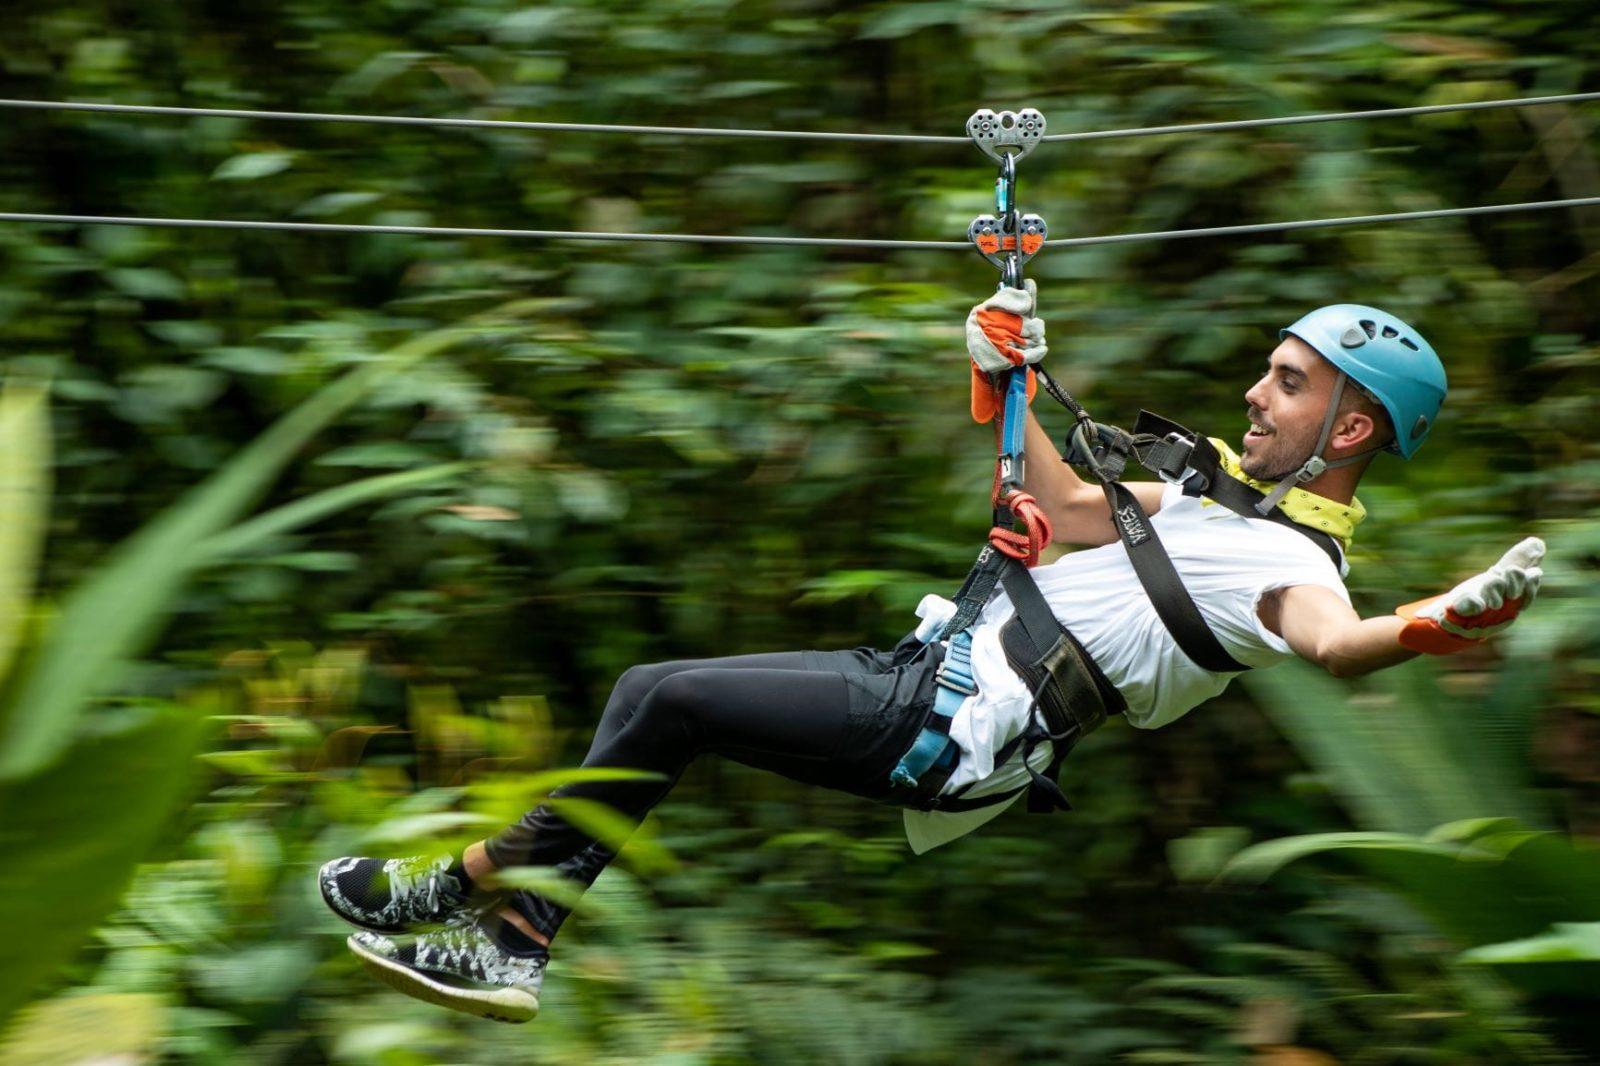 costa-rica-aerial-gda-global-dmc-alliance-rainforest-beyond-travel-incentives-zipline2-min